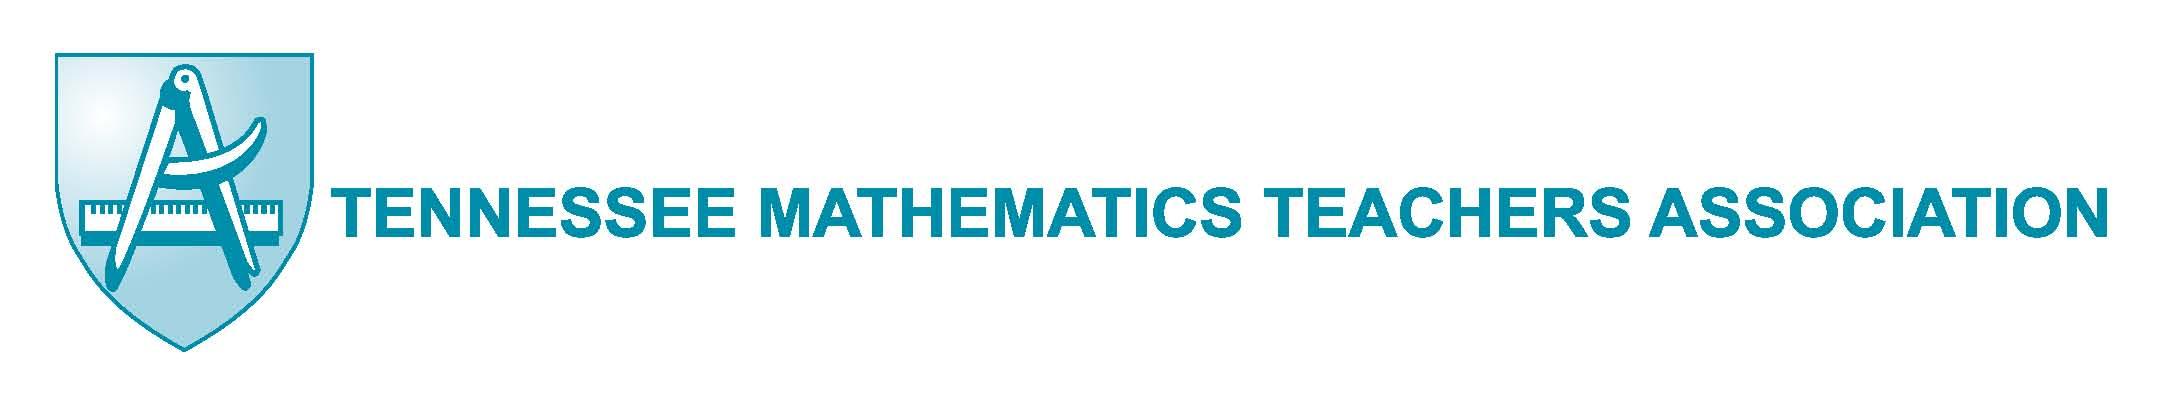 Tennessee Mathematics Teachers Association - Contests